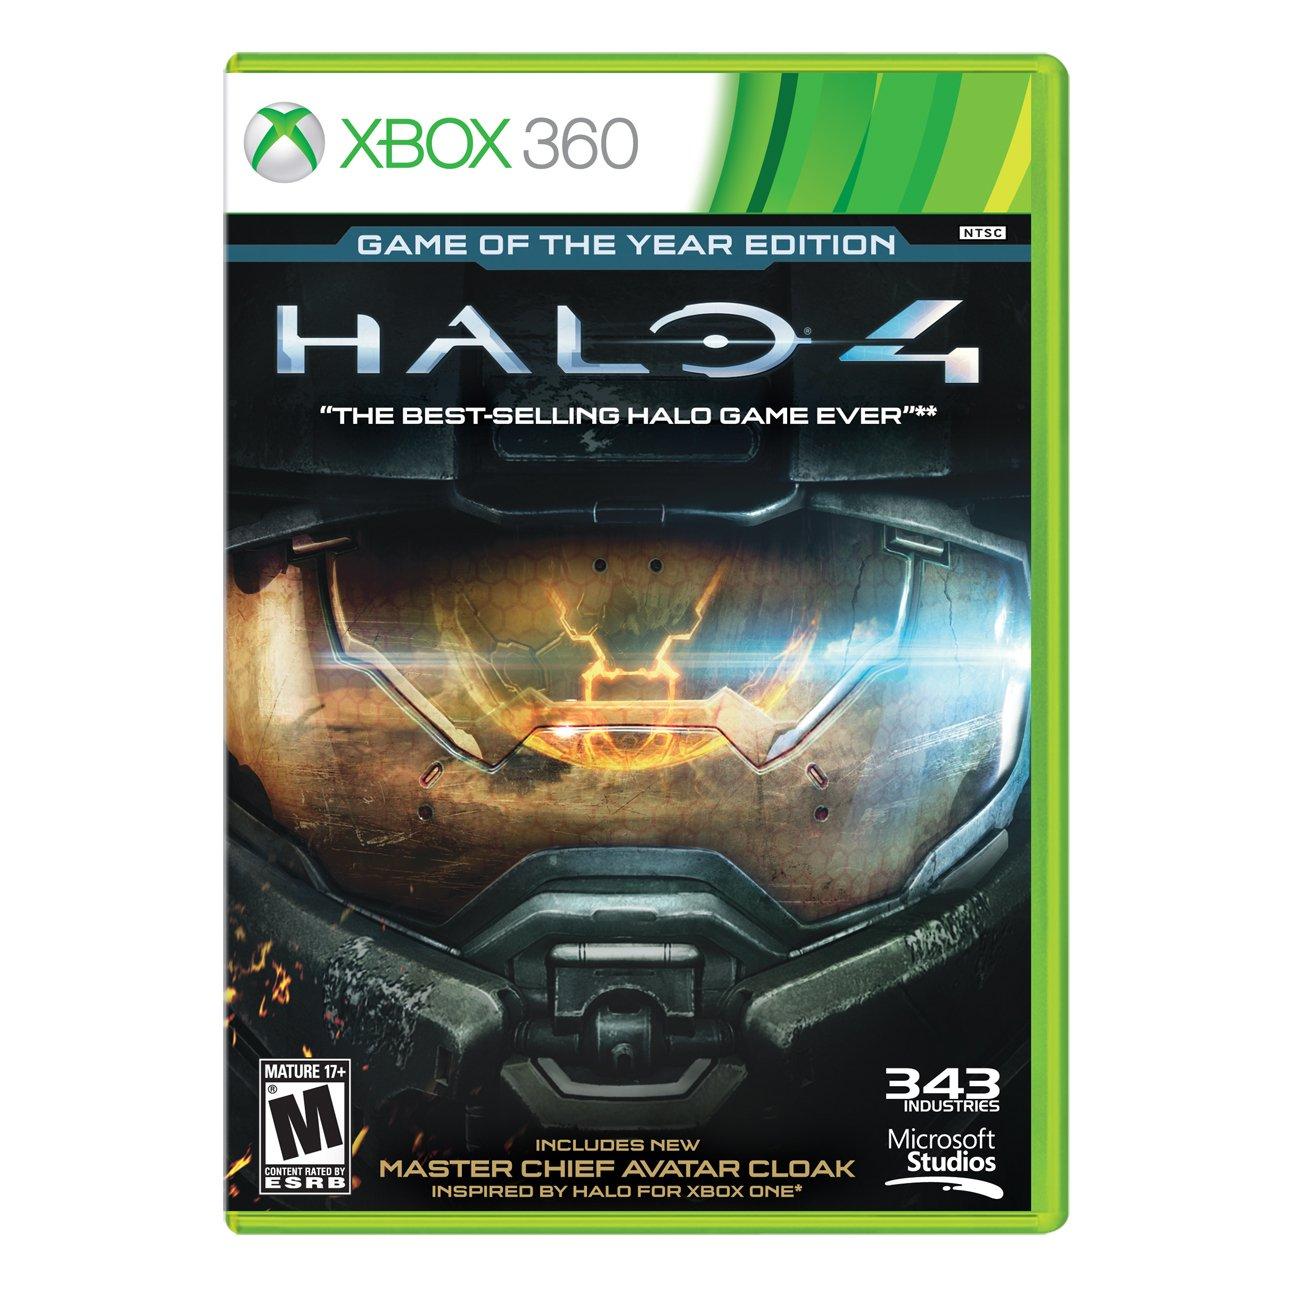 XBOX 360 Video Game-HALO 4